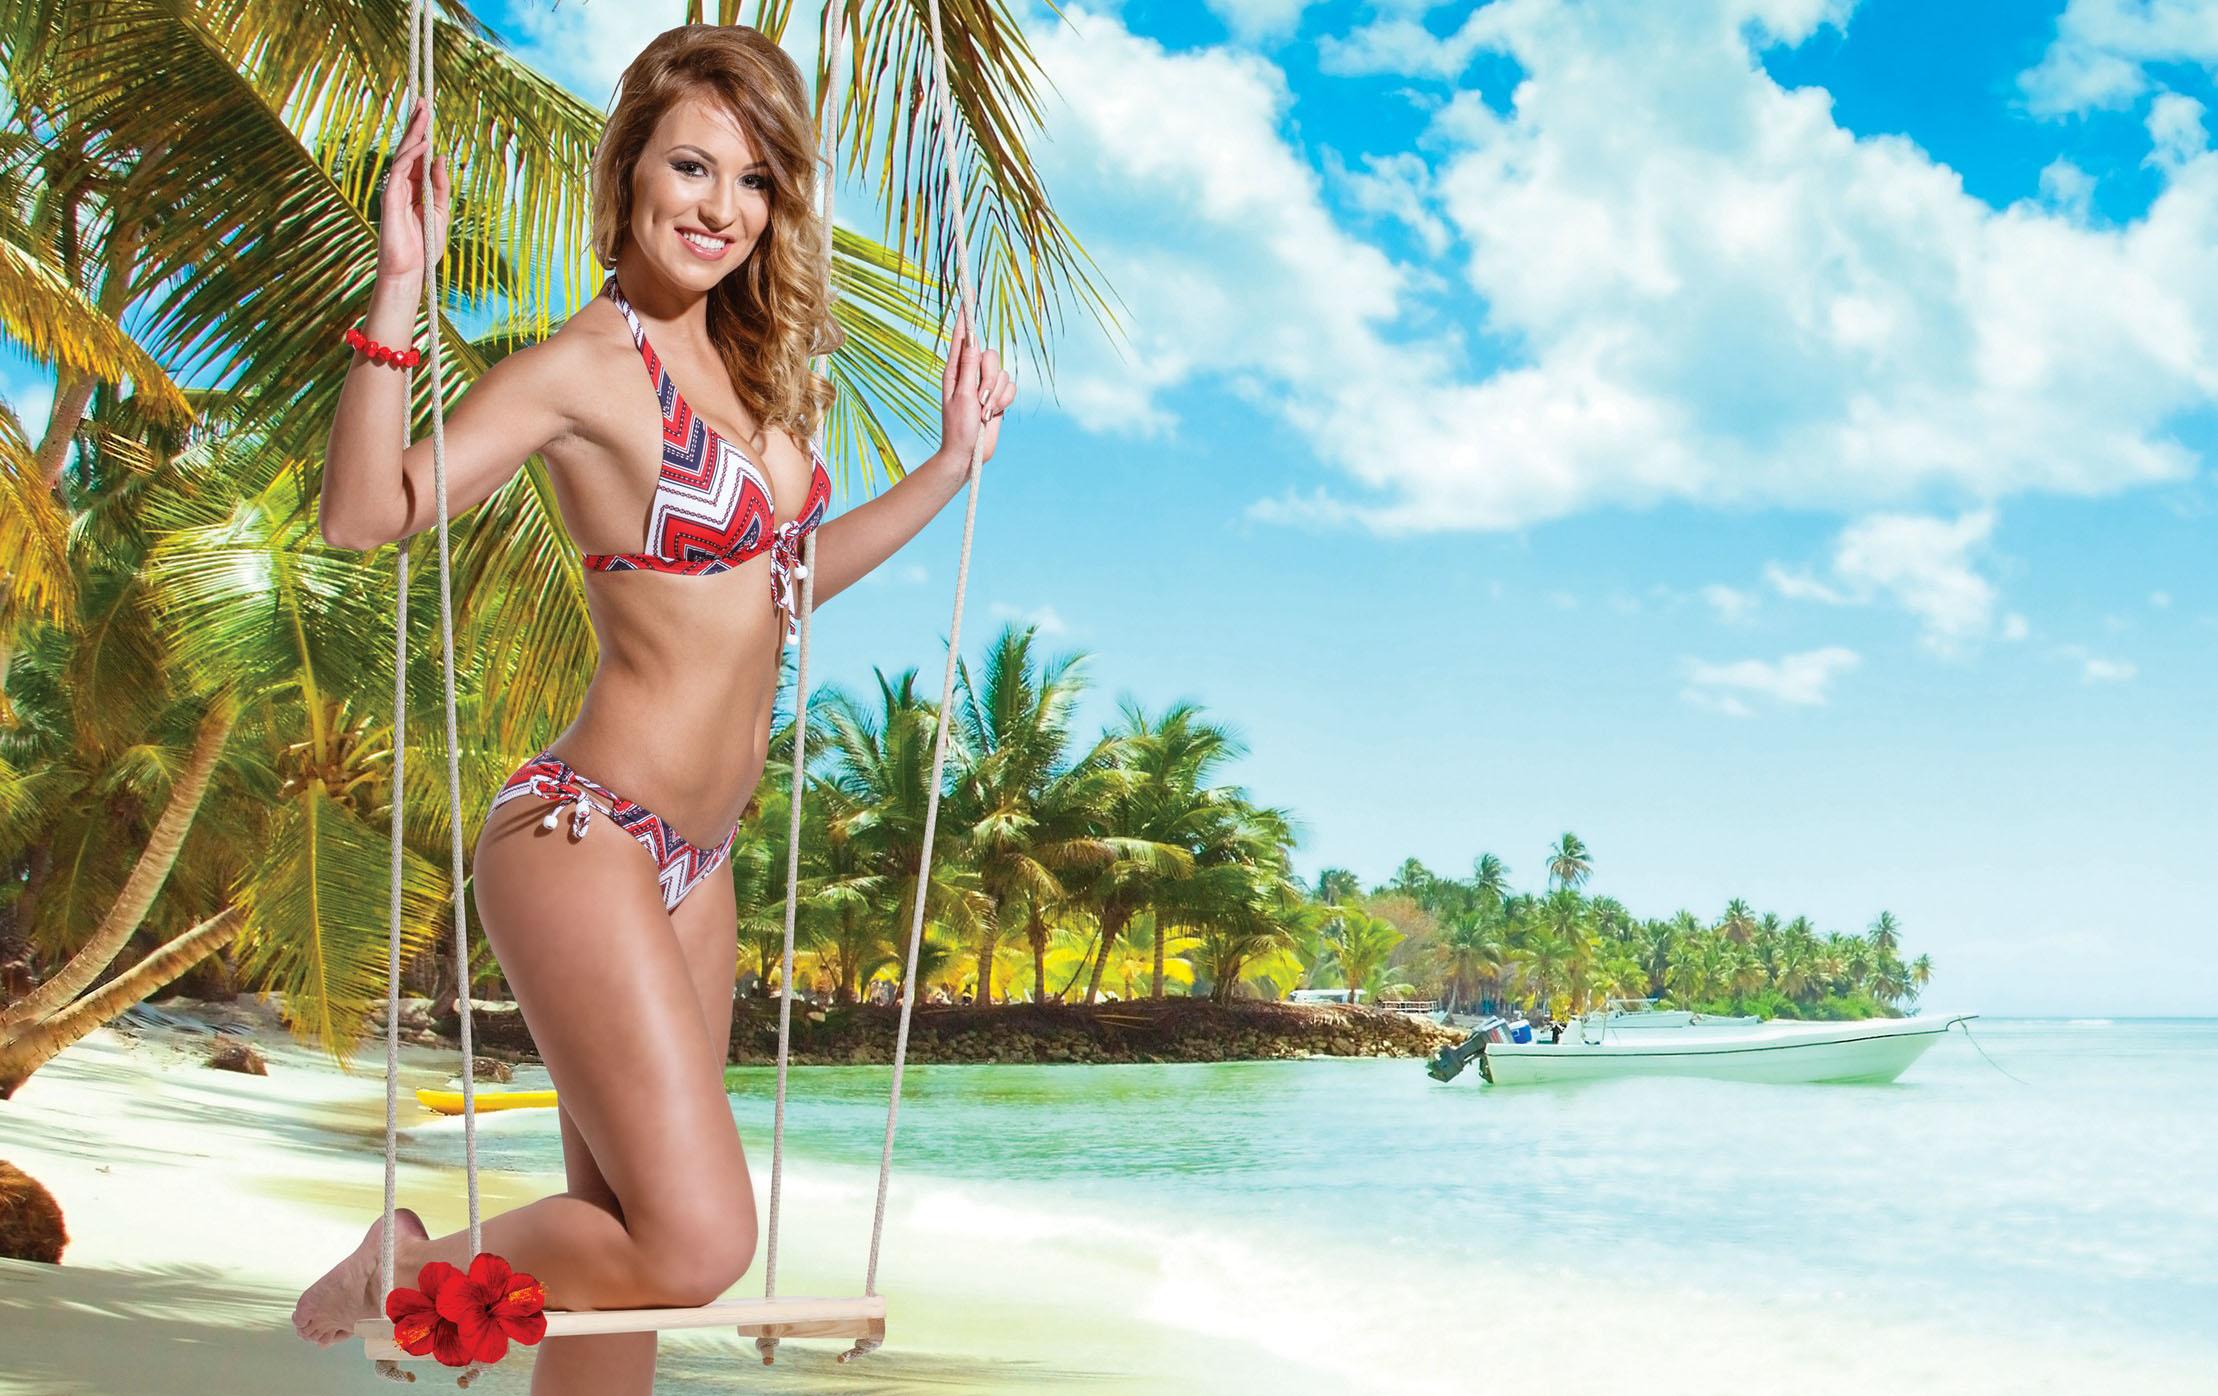 672-17-22-bikini-Marine-Style-carib-swimwear